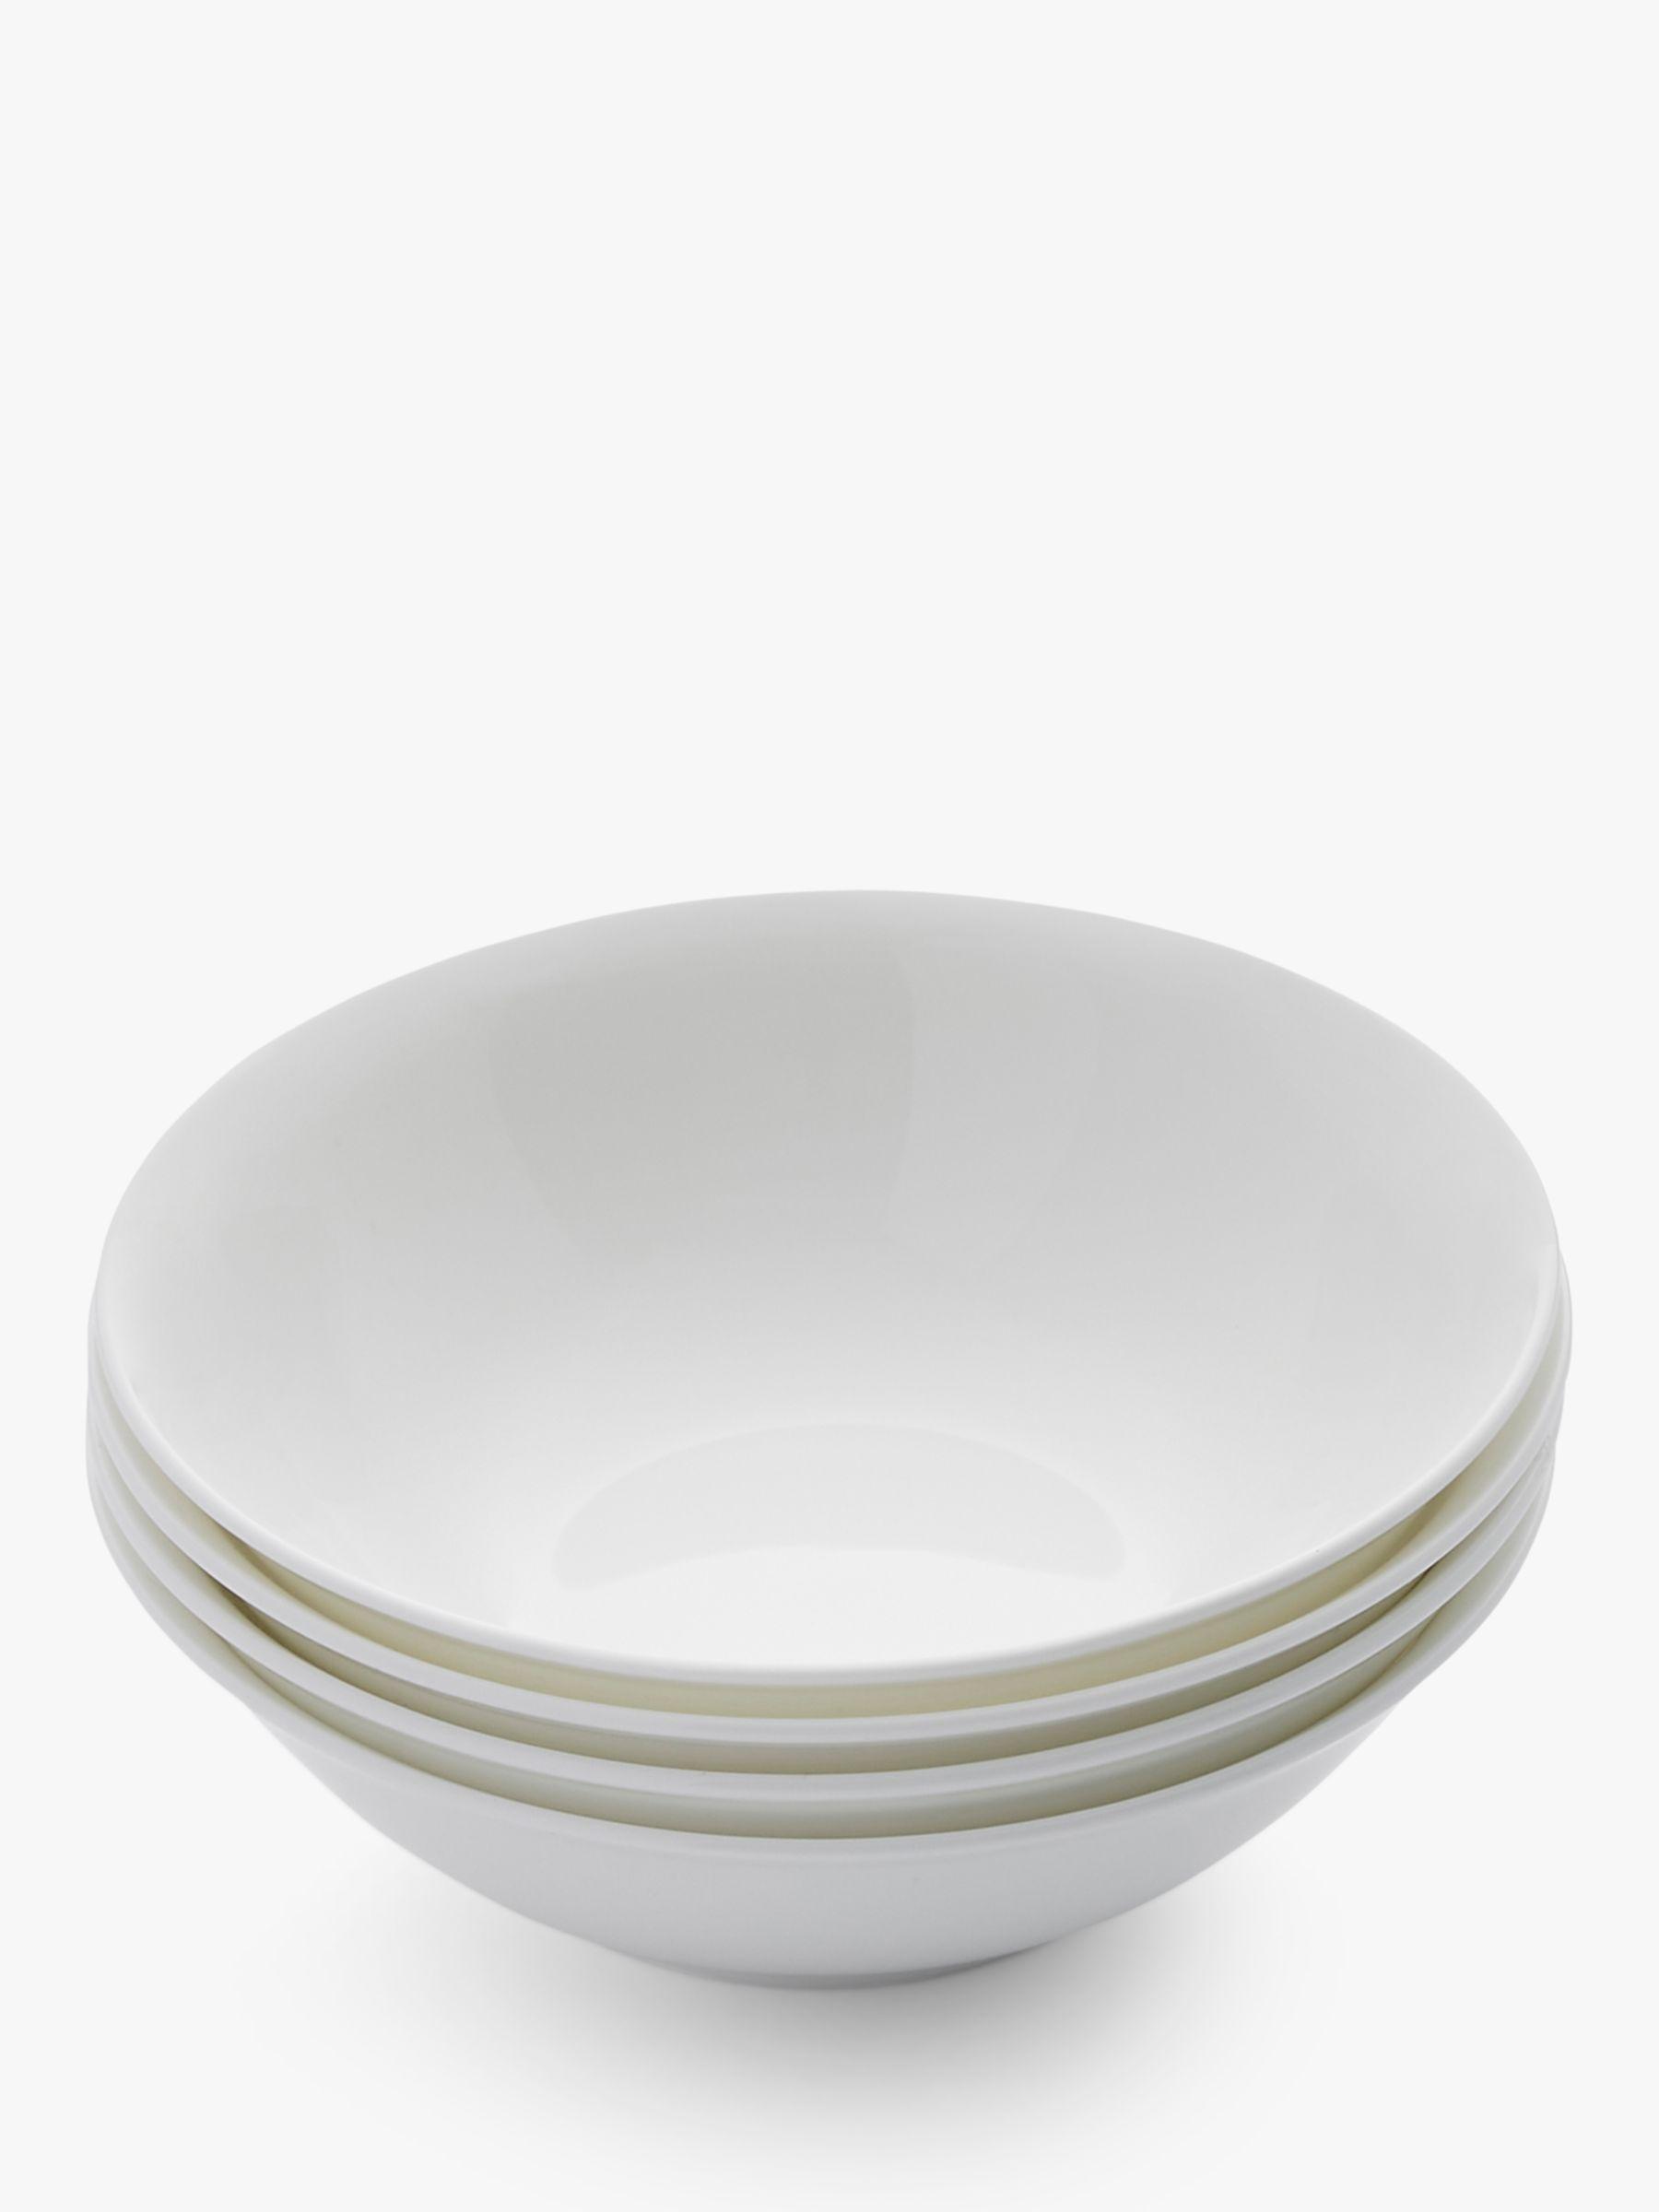 Royal Worcester Royal Worcester Serendipity Bone China Cereal Bowls, 16cm, Set of 4, White